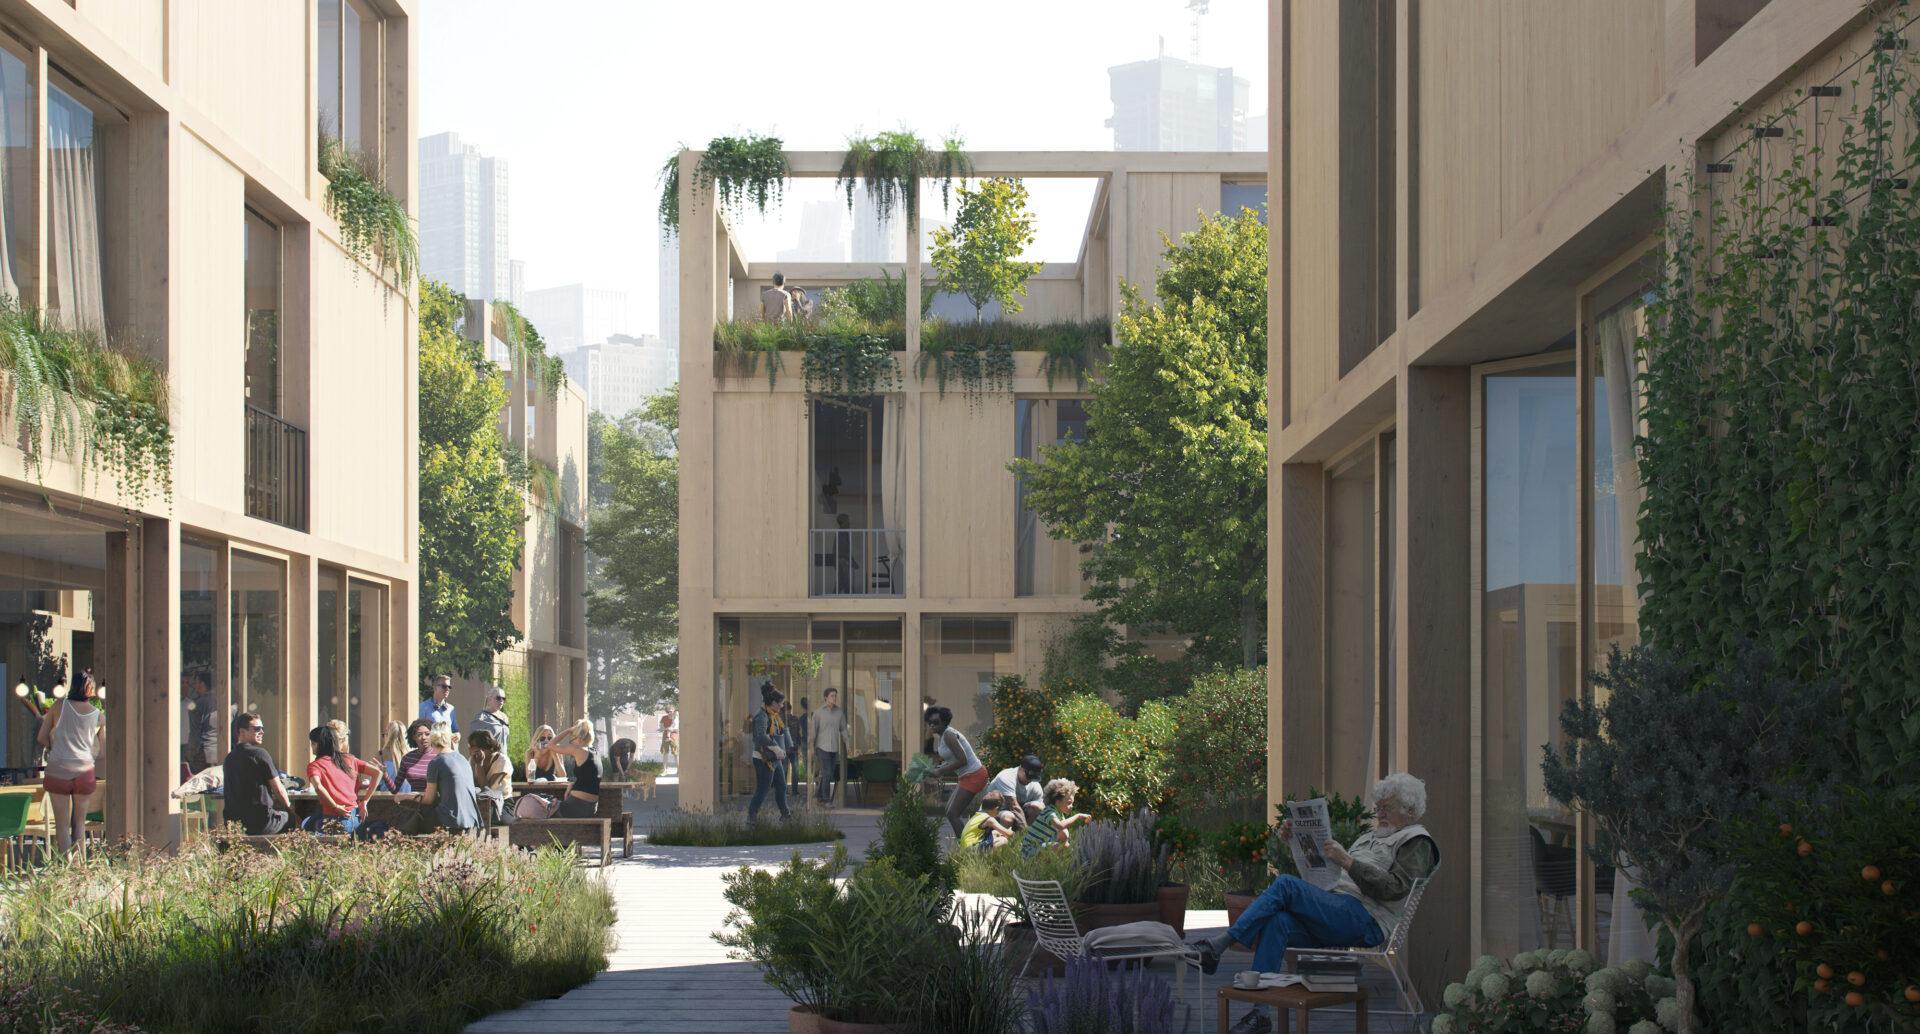 Urban Village Project ที่อยู่อาศัยมีชีวิต ใช้ทรัพยากรอย่างยั่งยืน คุ้มค่าราคาจ่าย